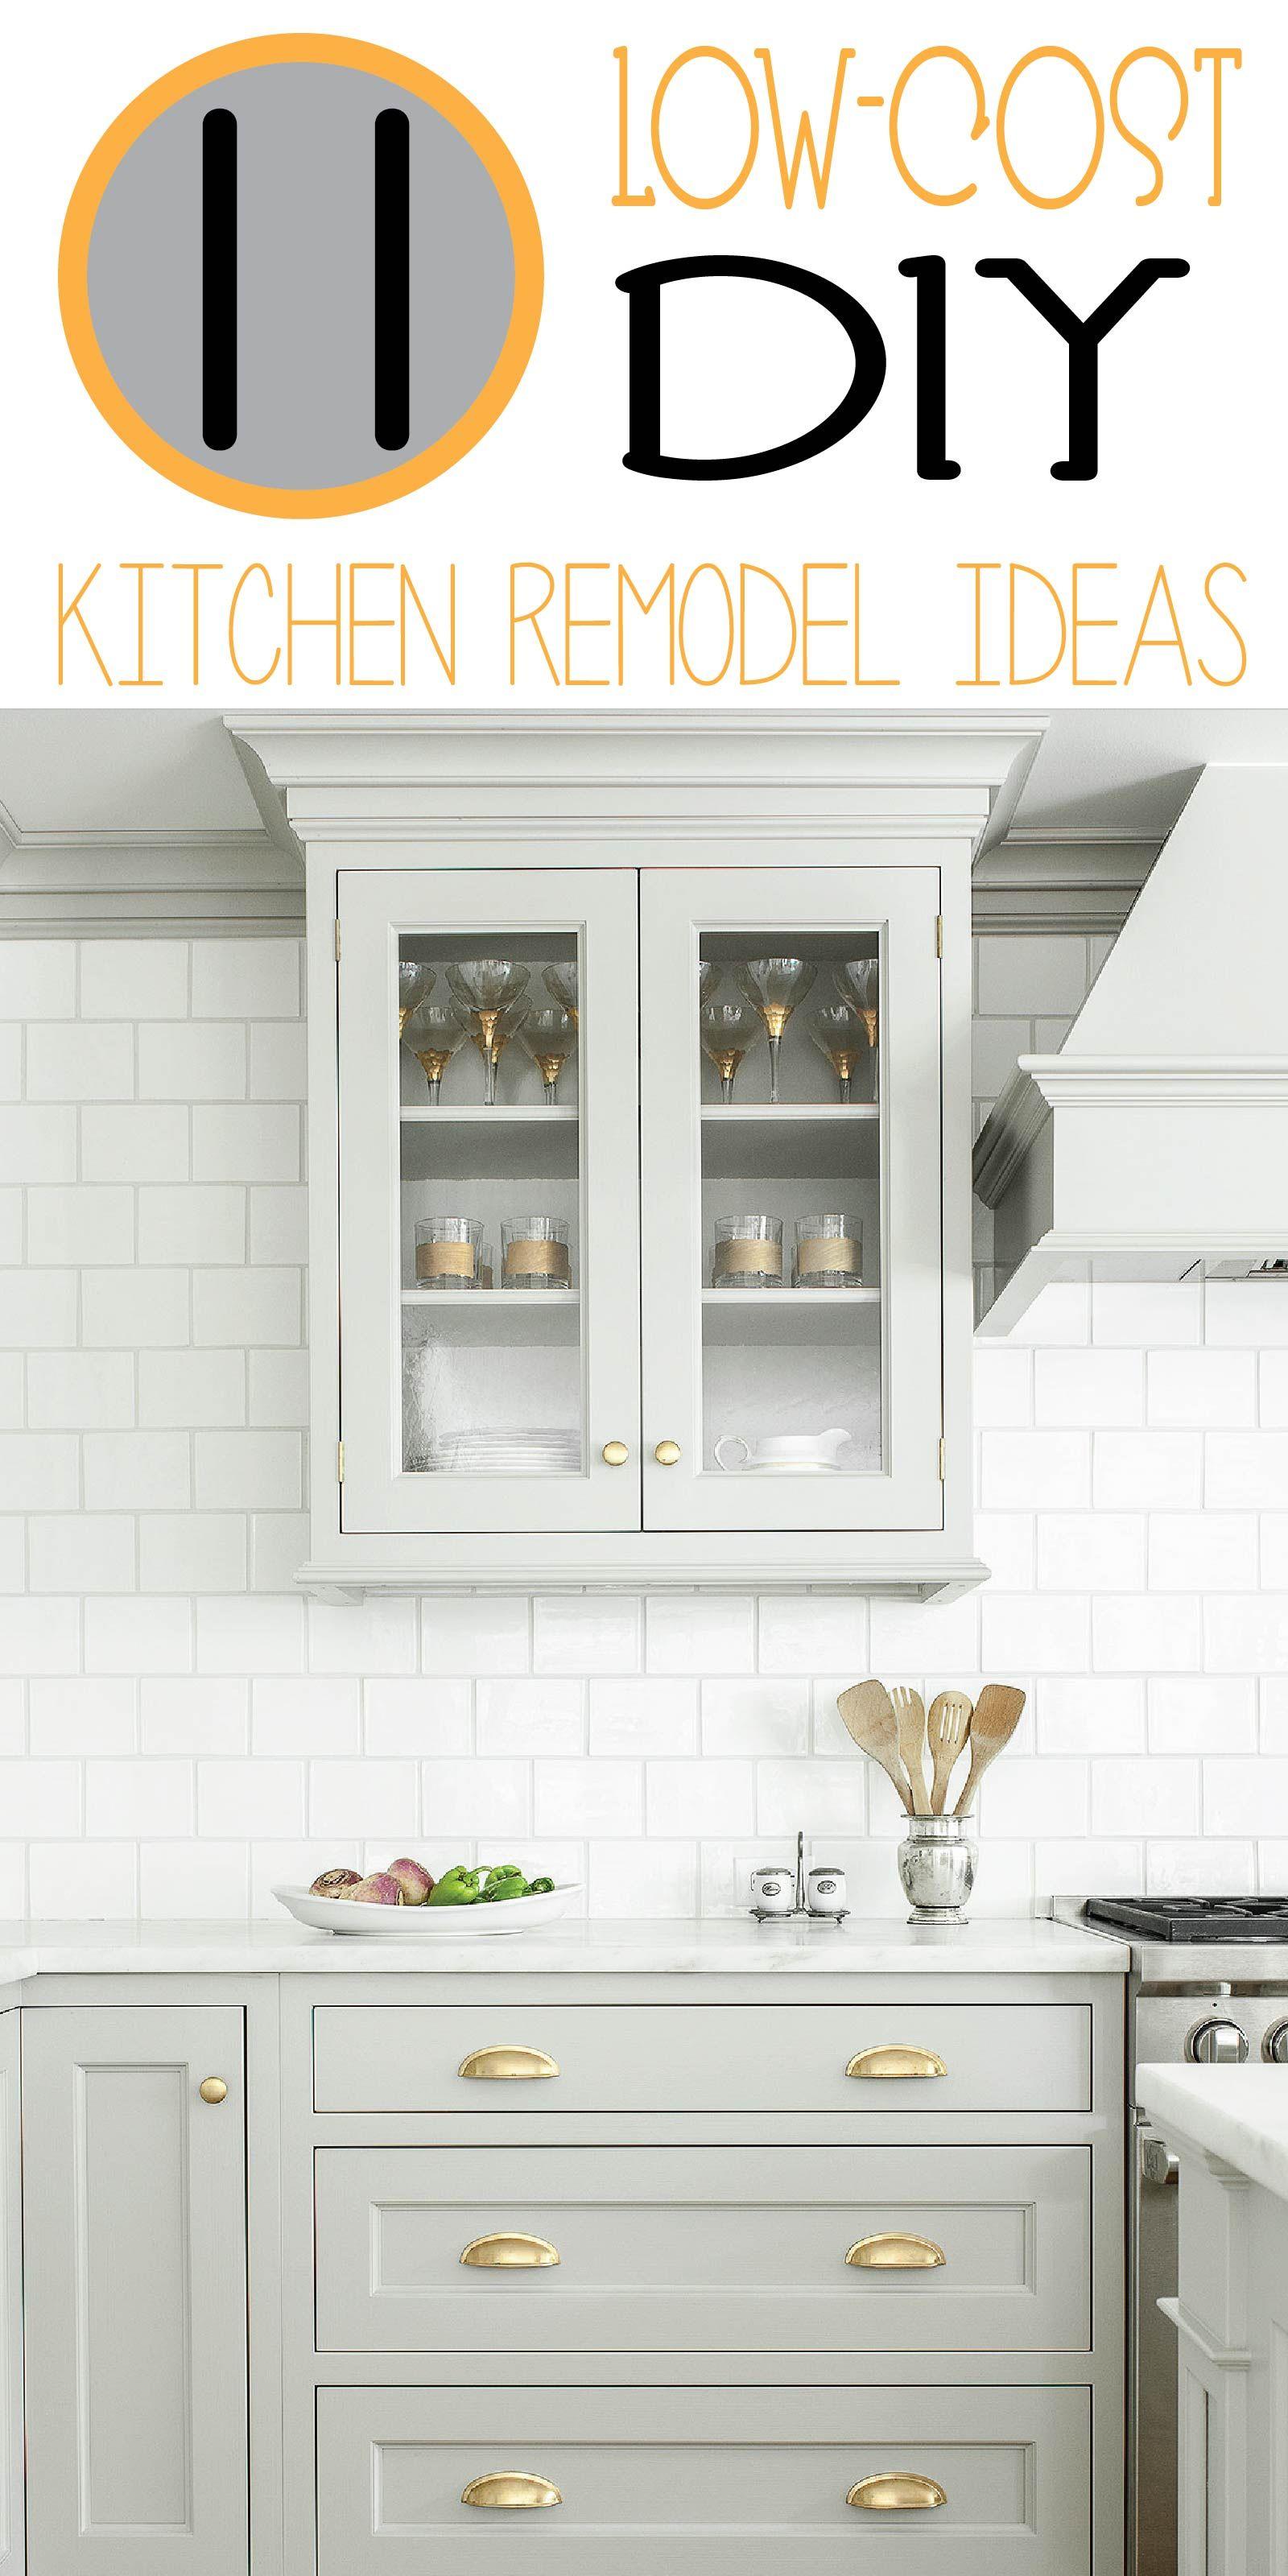 11 Ways to DIY Kitchen Remodel! | Diy kitchen remodel, Kitchens and ...